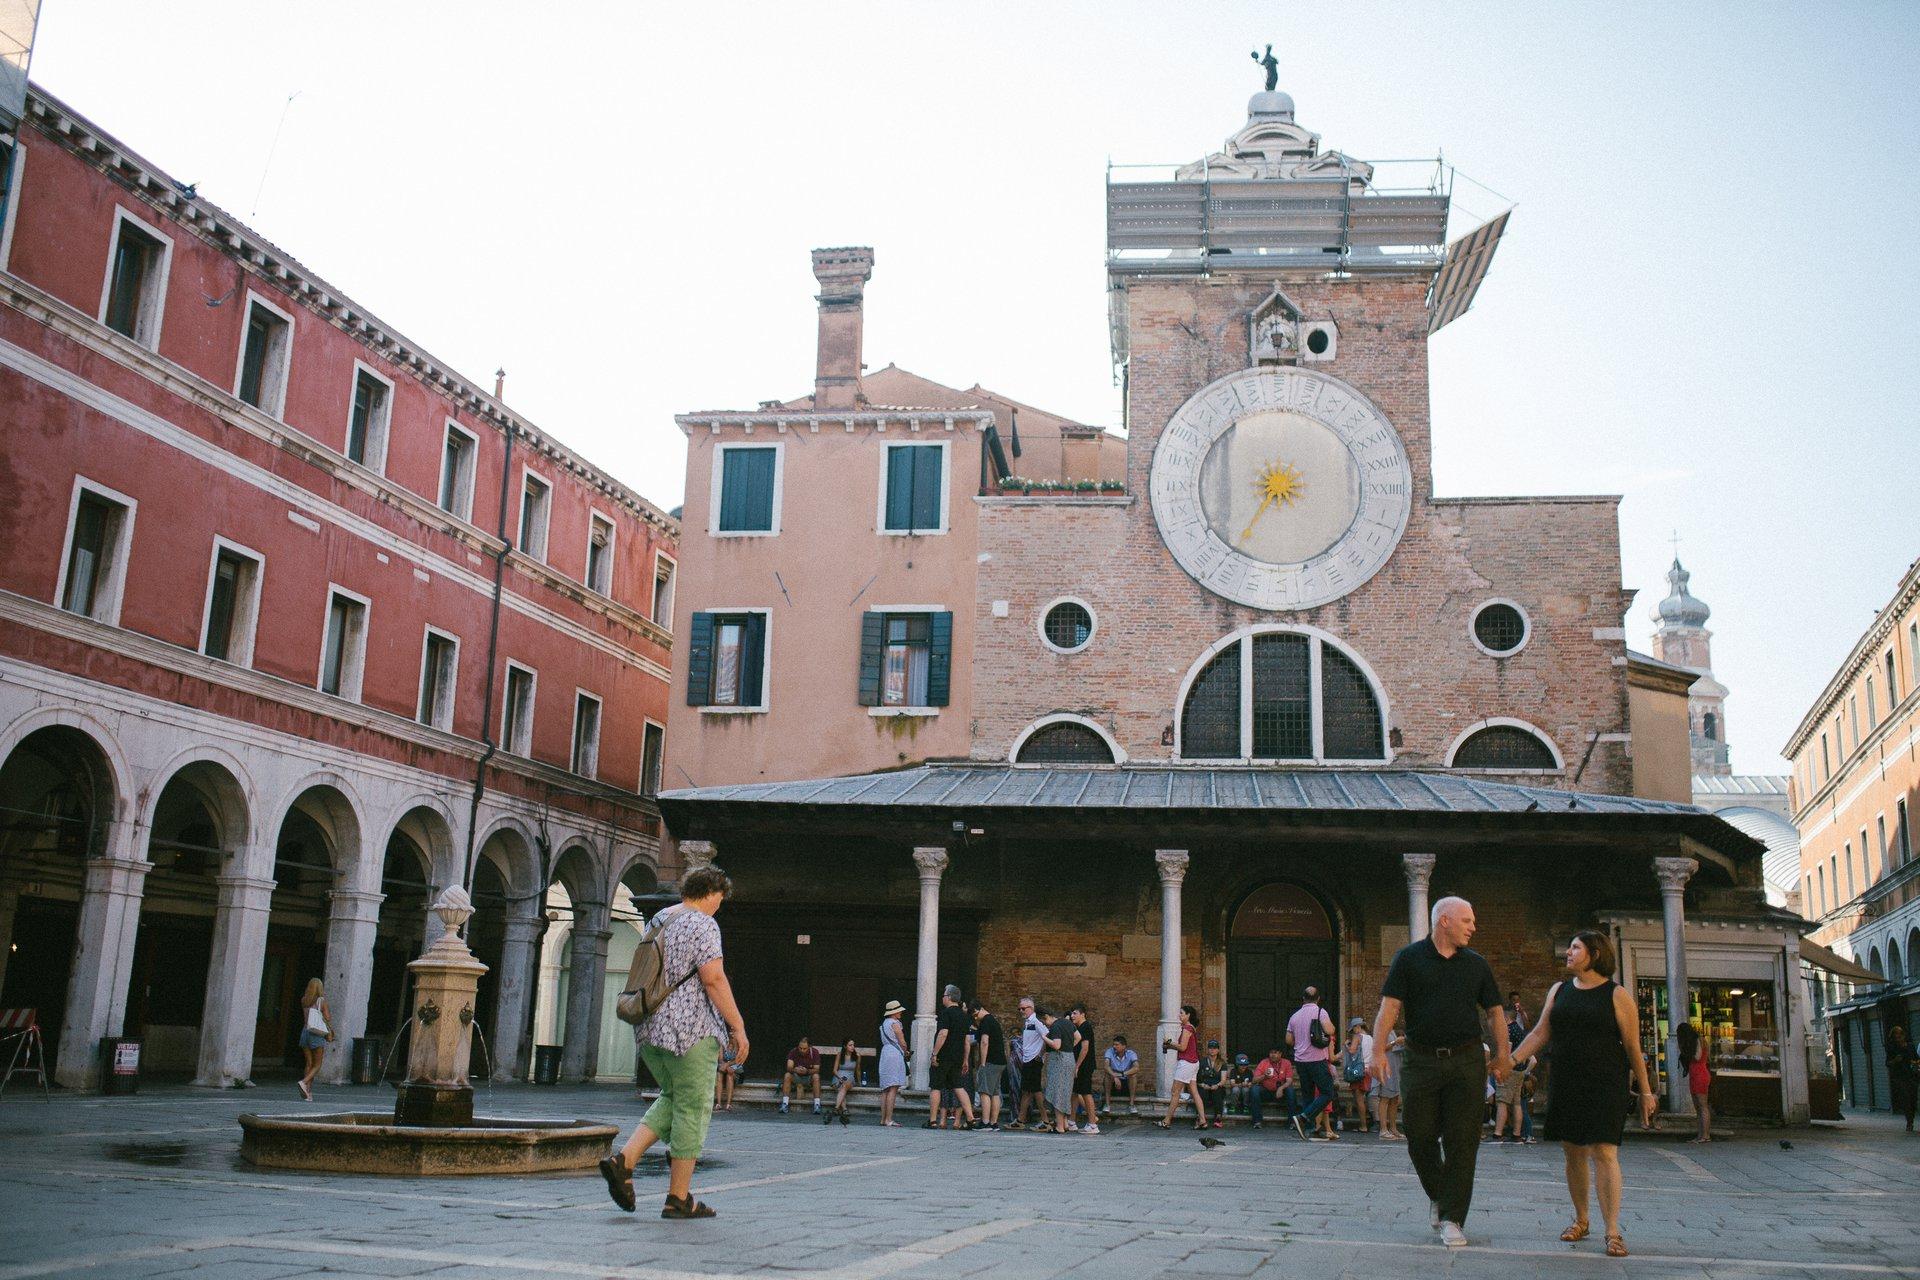 Venice-Italy-travel-story-Flytographer-12